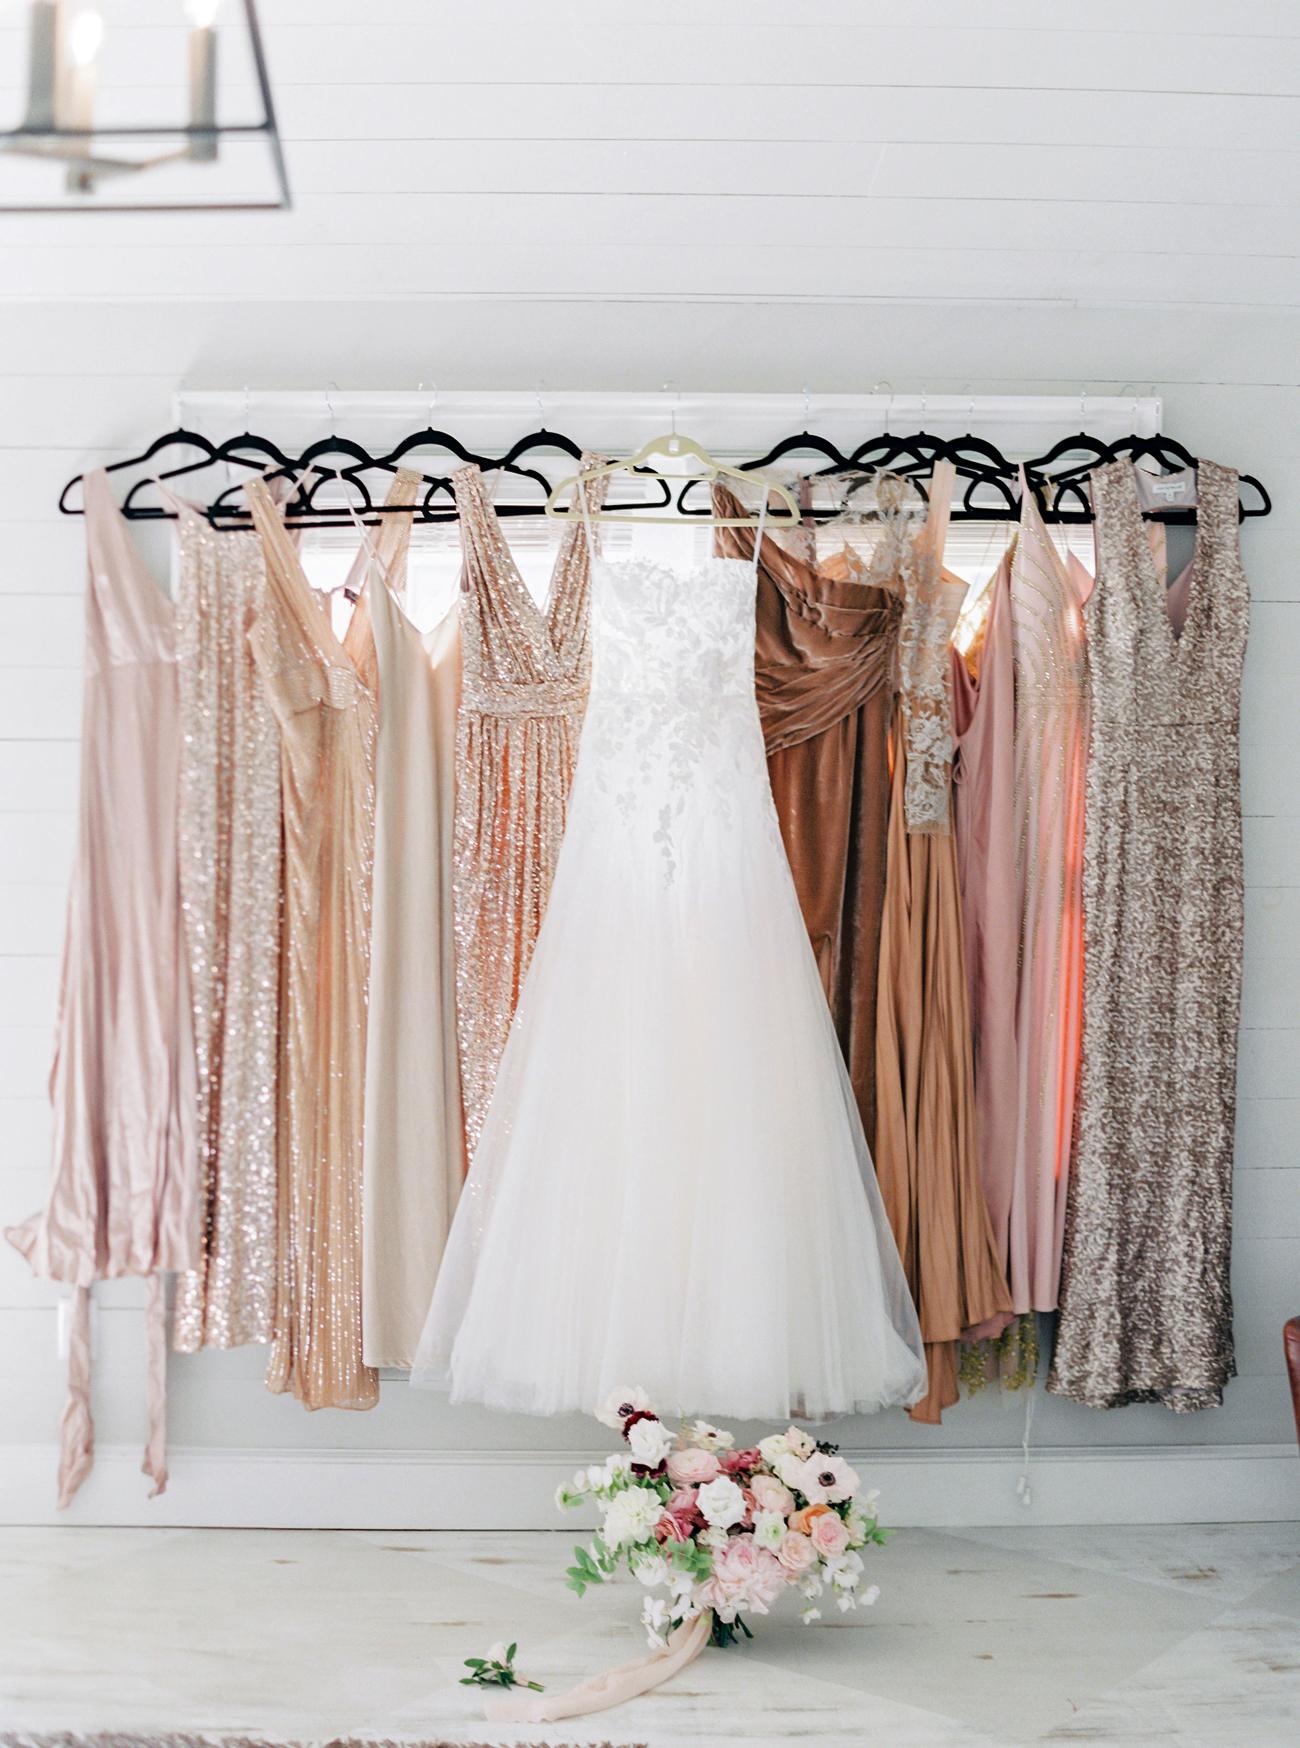 bride's hanging custom mira zwillinger wedding dress with blush and peach tone glittery bridesmaids dresses